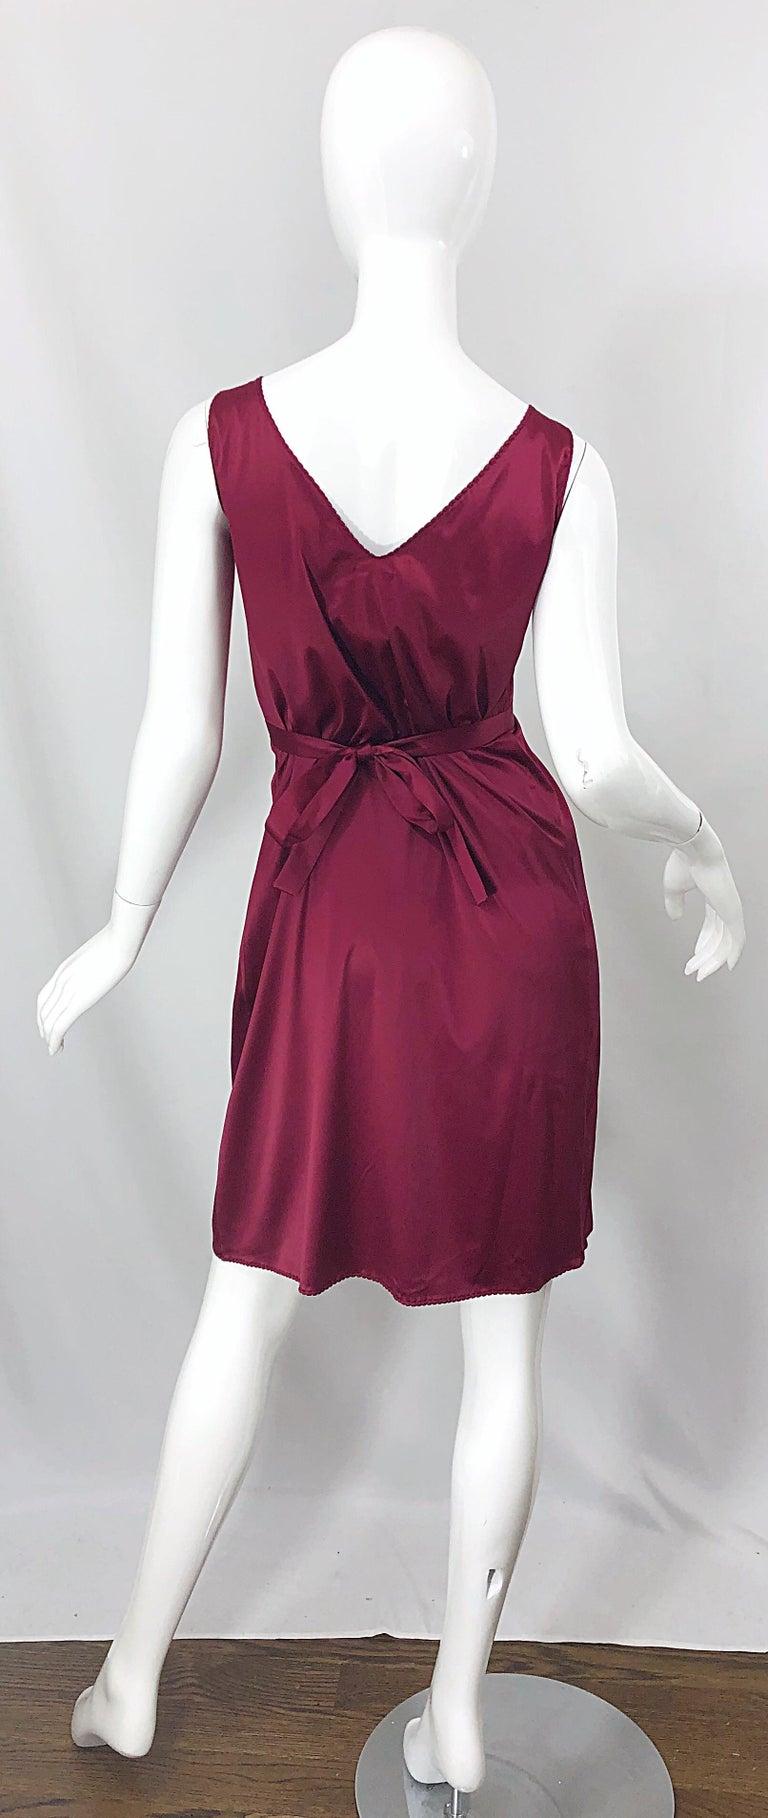 Brown 2000s John Galliano Sz 42 (US 6 / 8) Burgundy Silk Feather Brooch Babydoll Dress For Sale